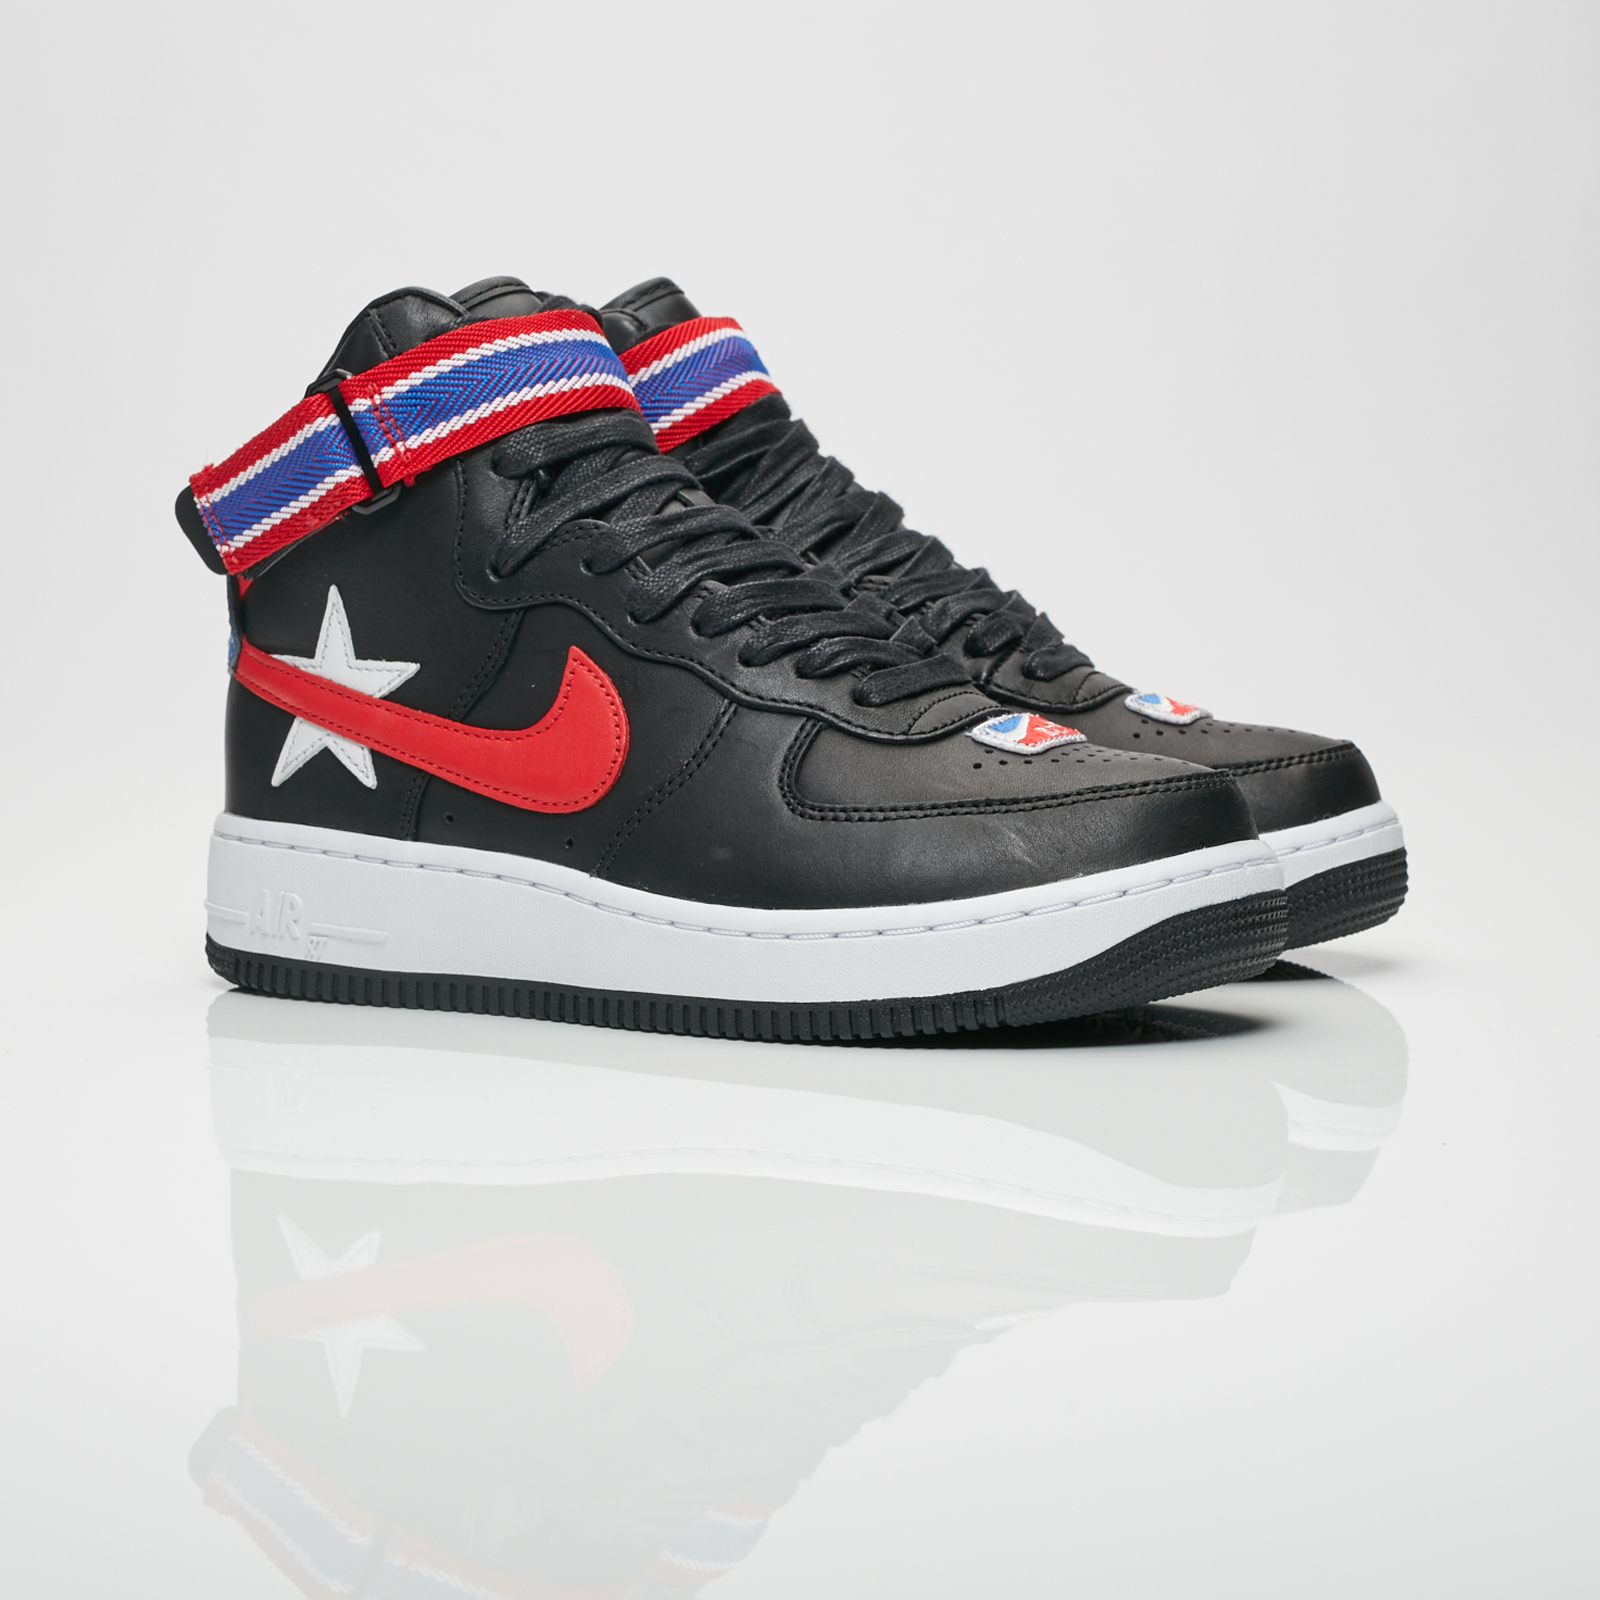 4822474cc1d Nike Air Force 1 Hi / RT - Aq3366-001 - Sneakersnstuff   sneakers ...